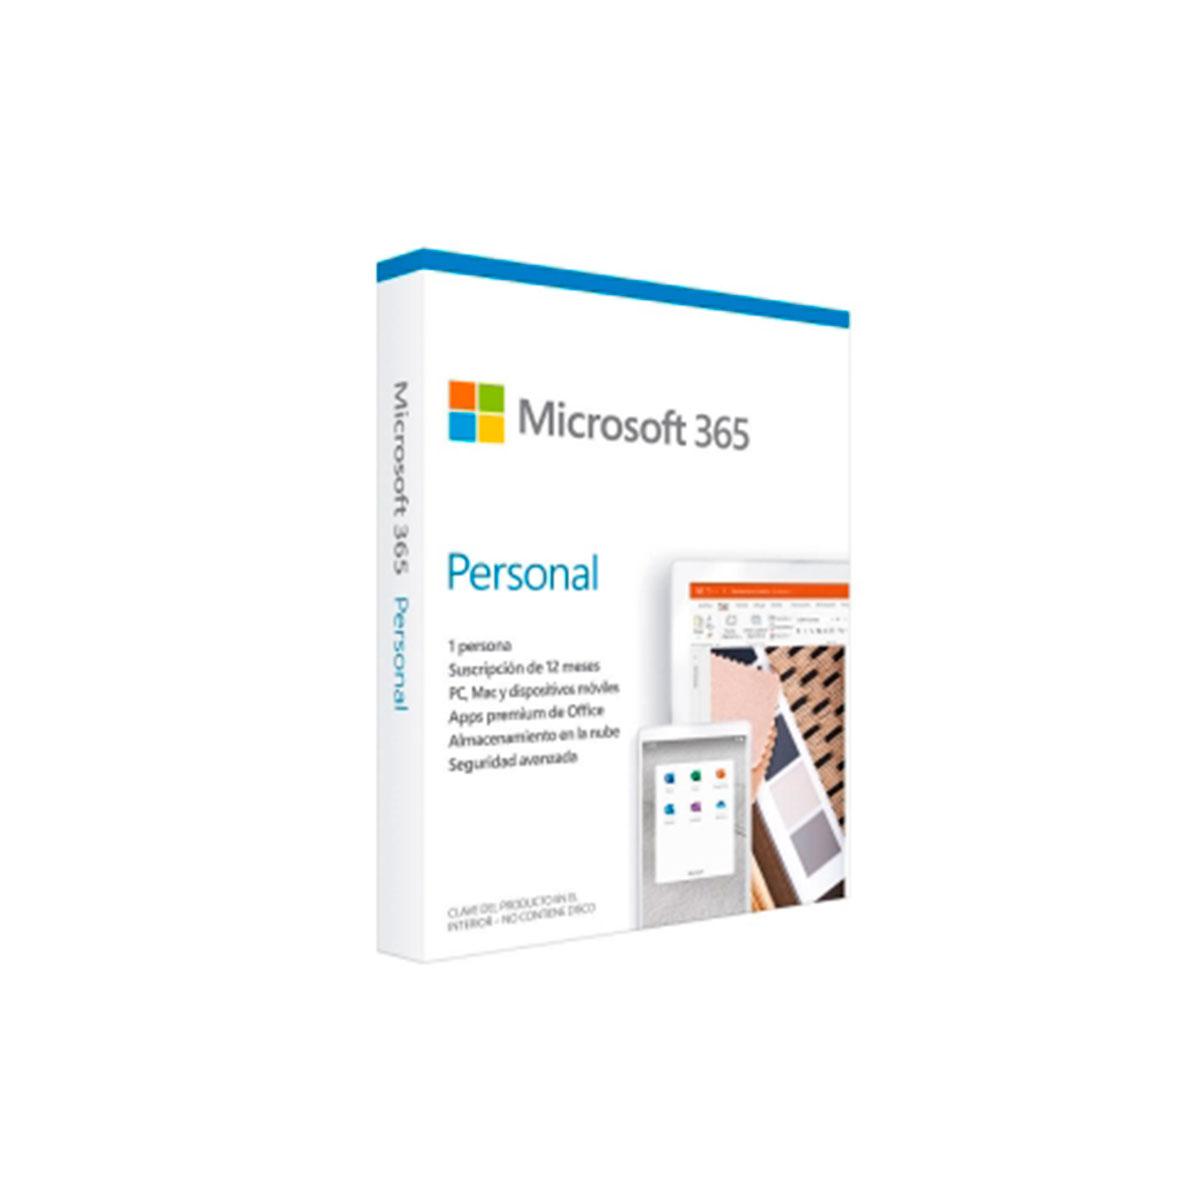 Microsoft 365 Personal Español